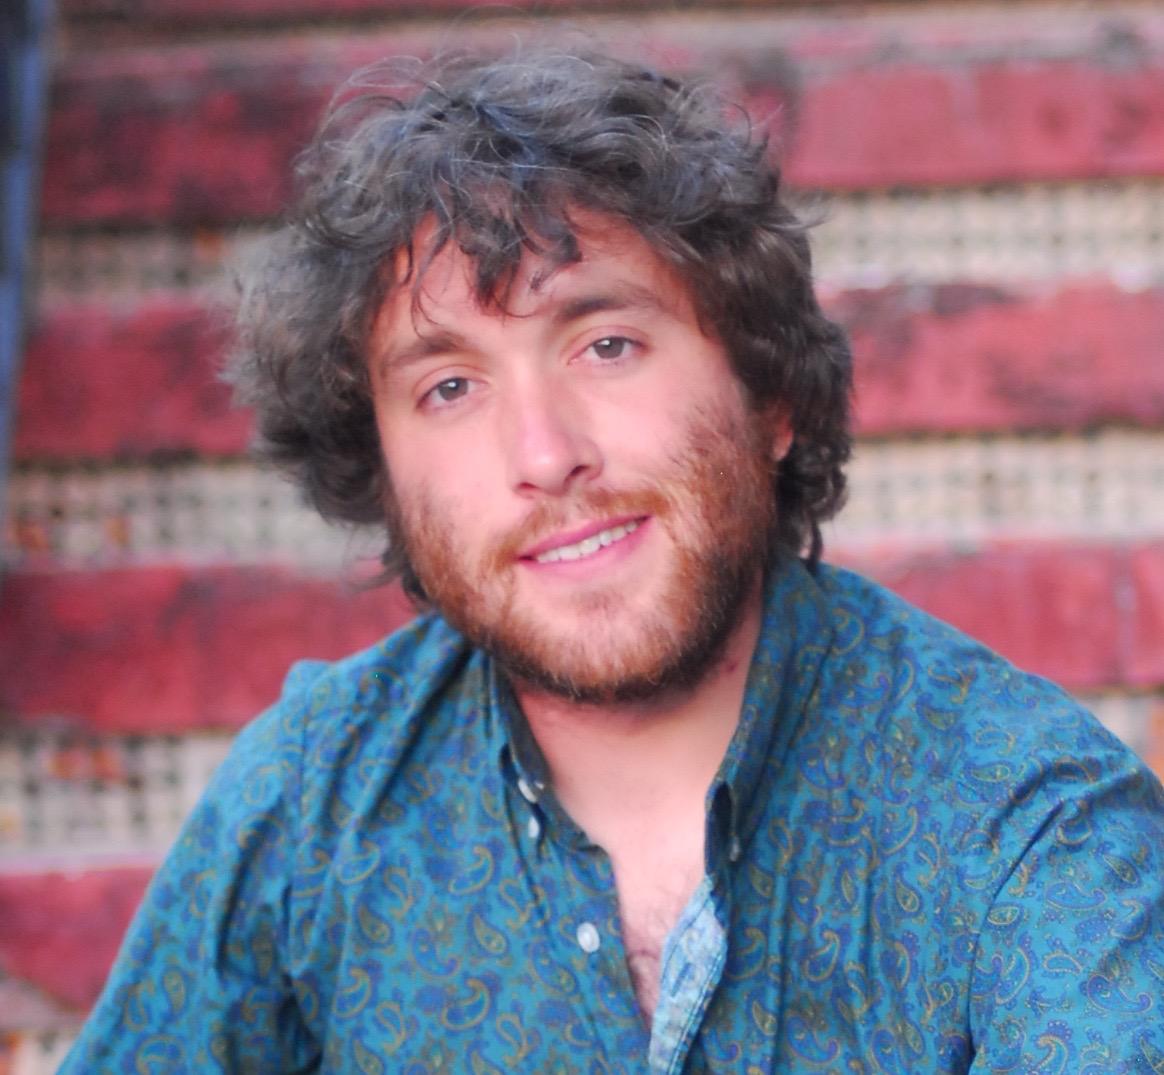 Joseph Duchene